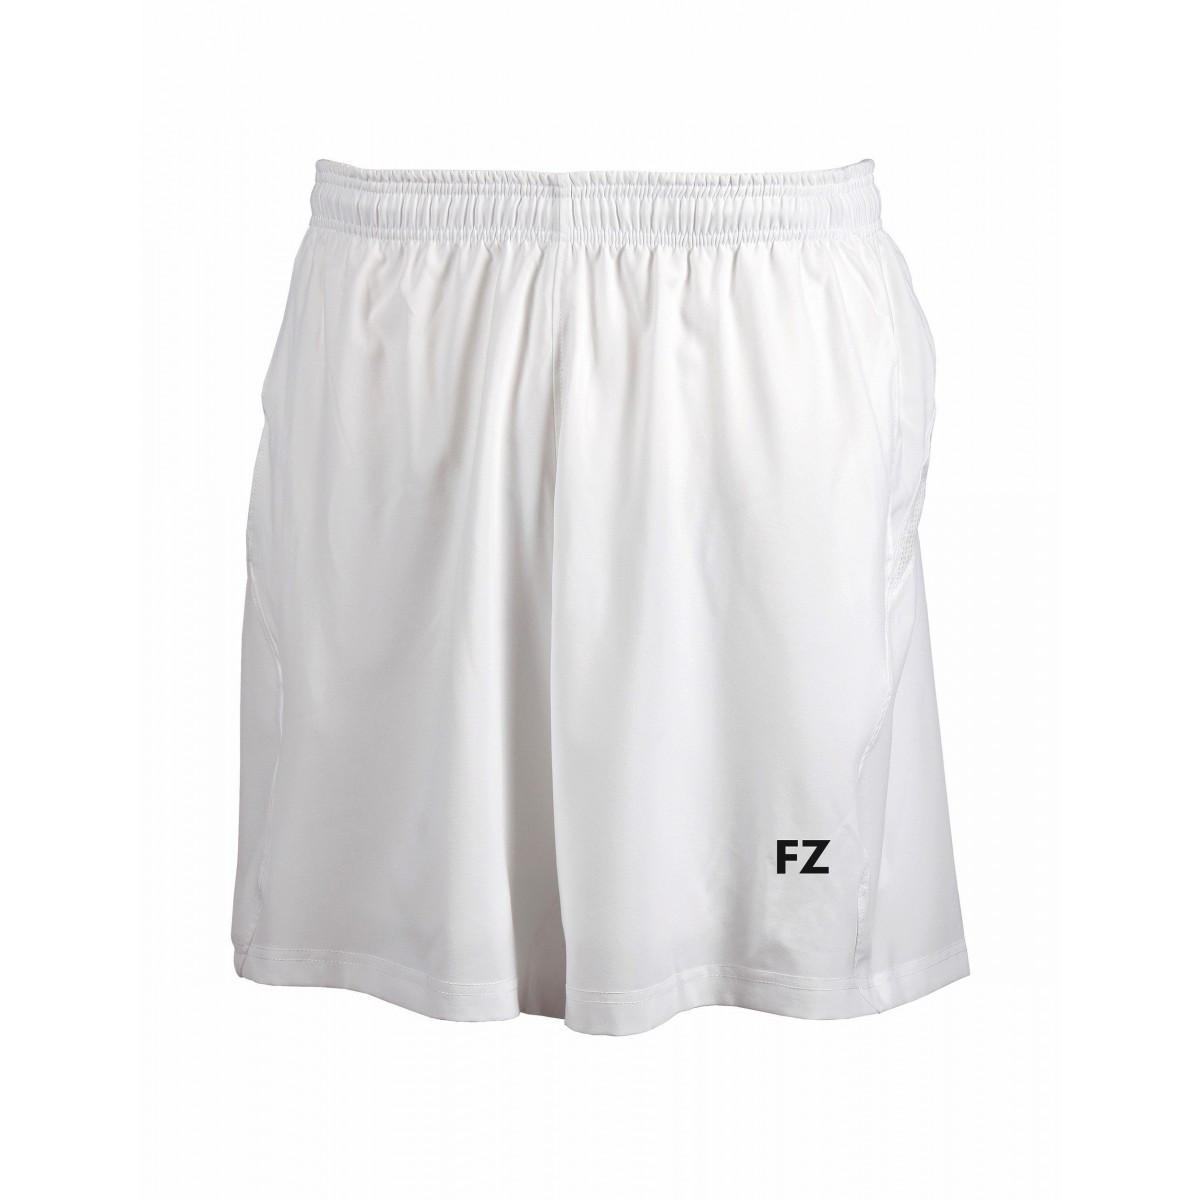 Спортивные шорты FZ FORZA Ajax Shorts White